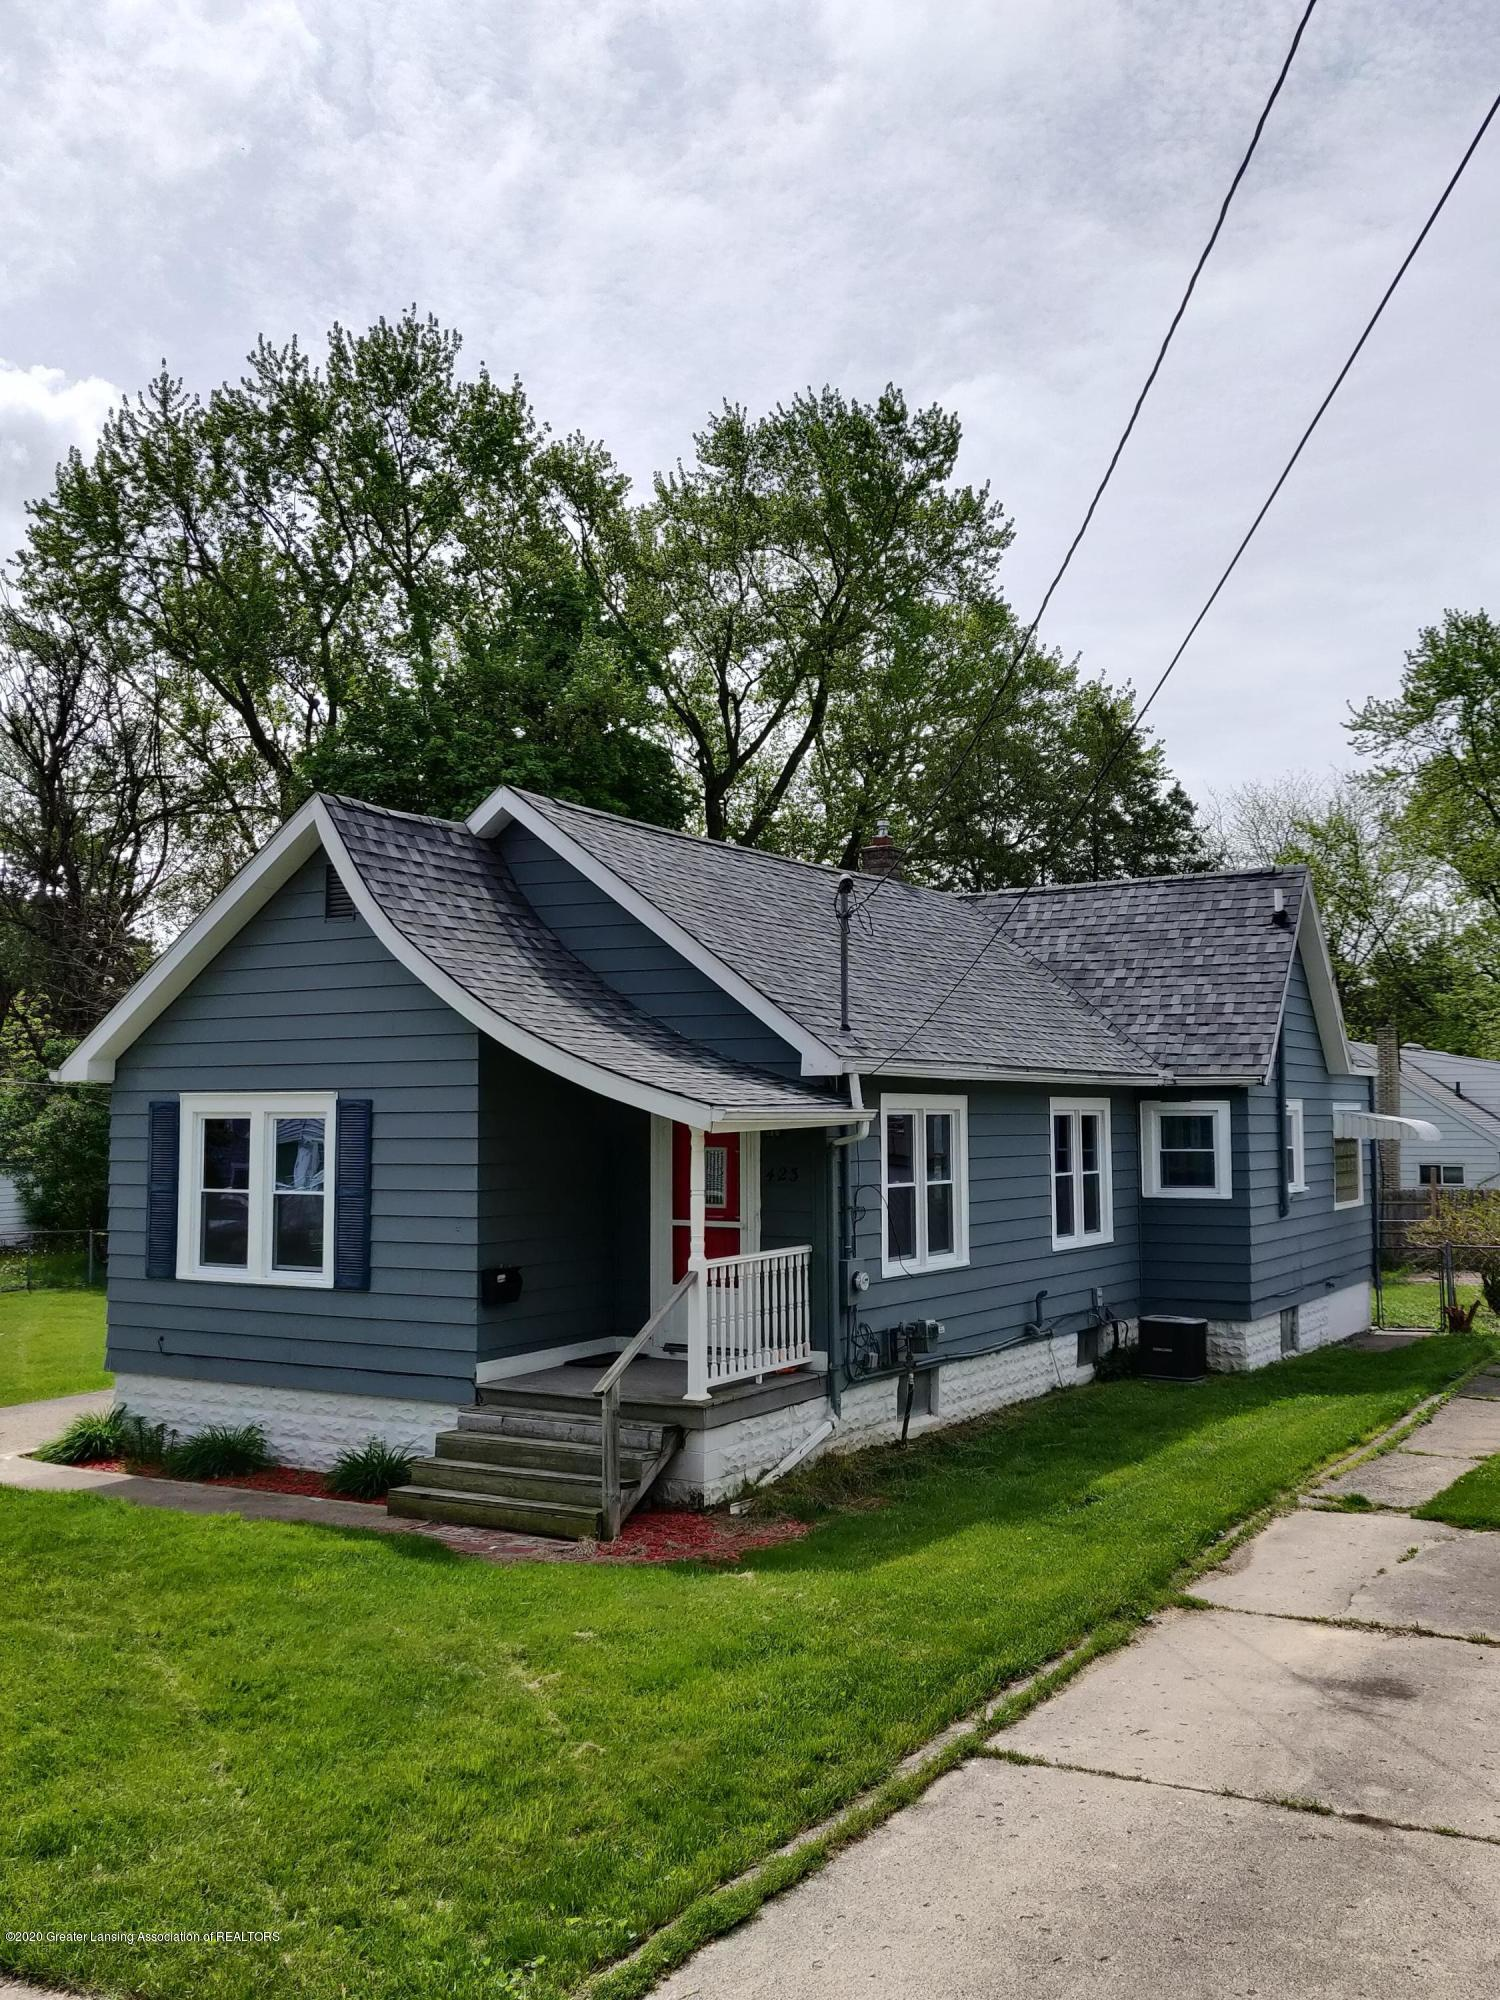 423 Dunlap St - Street view - 1